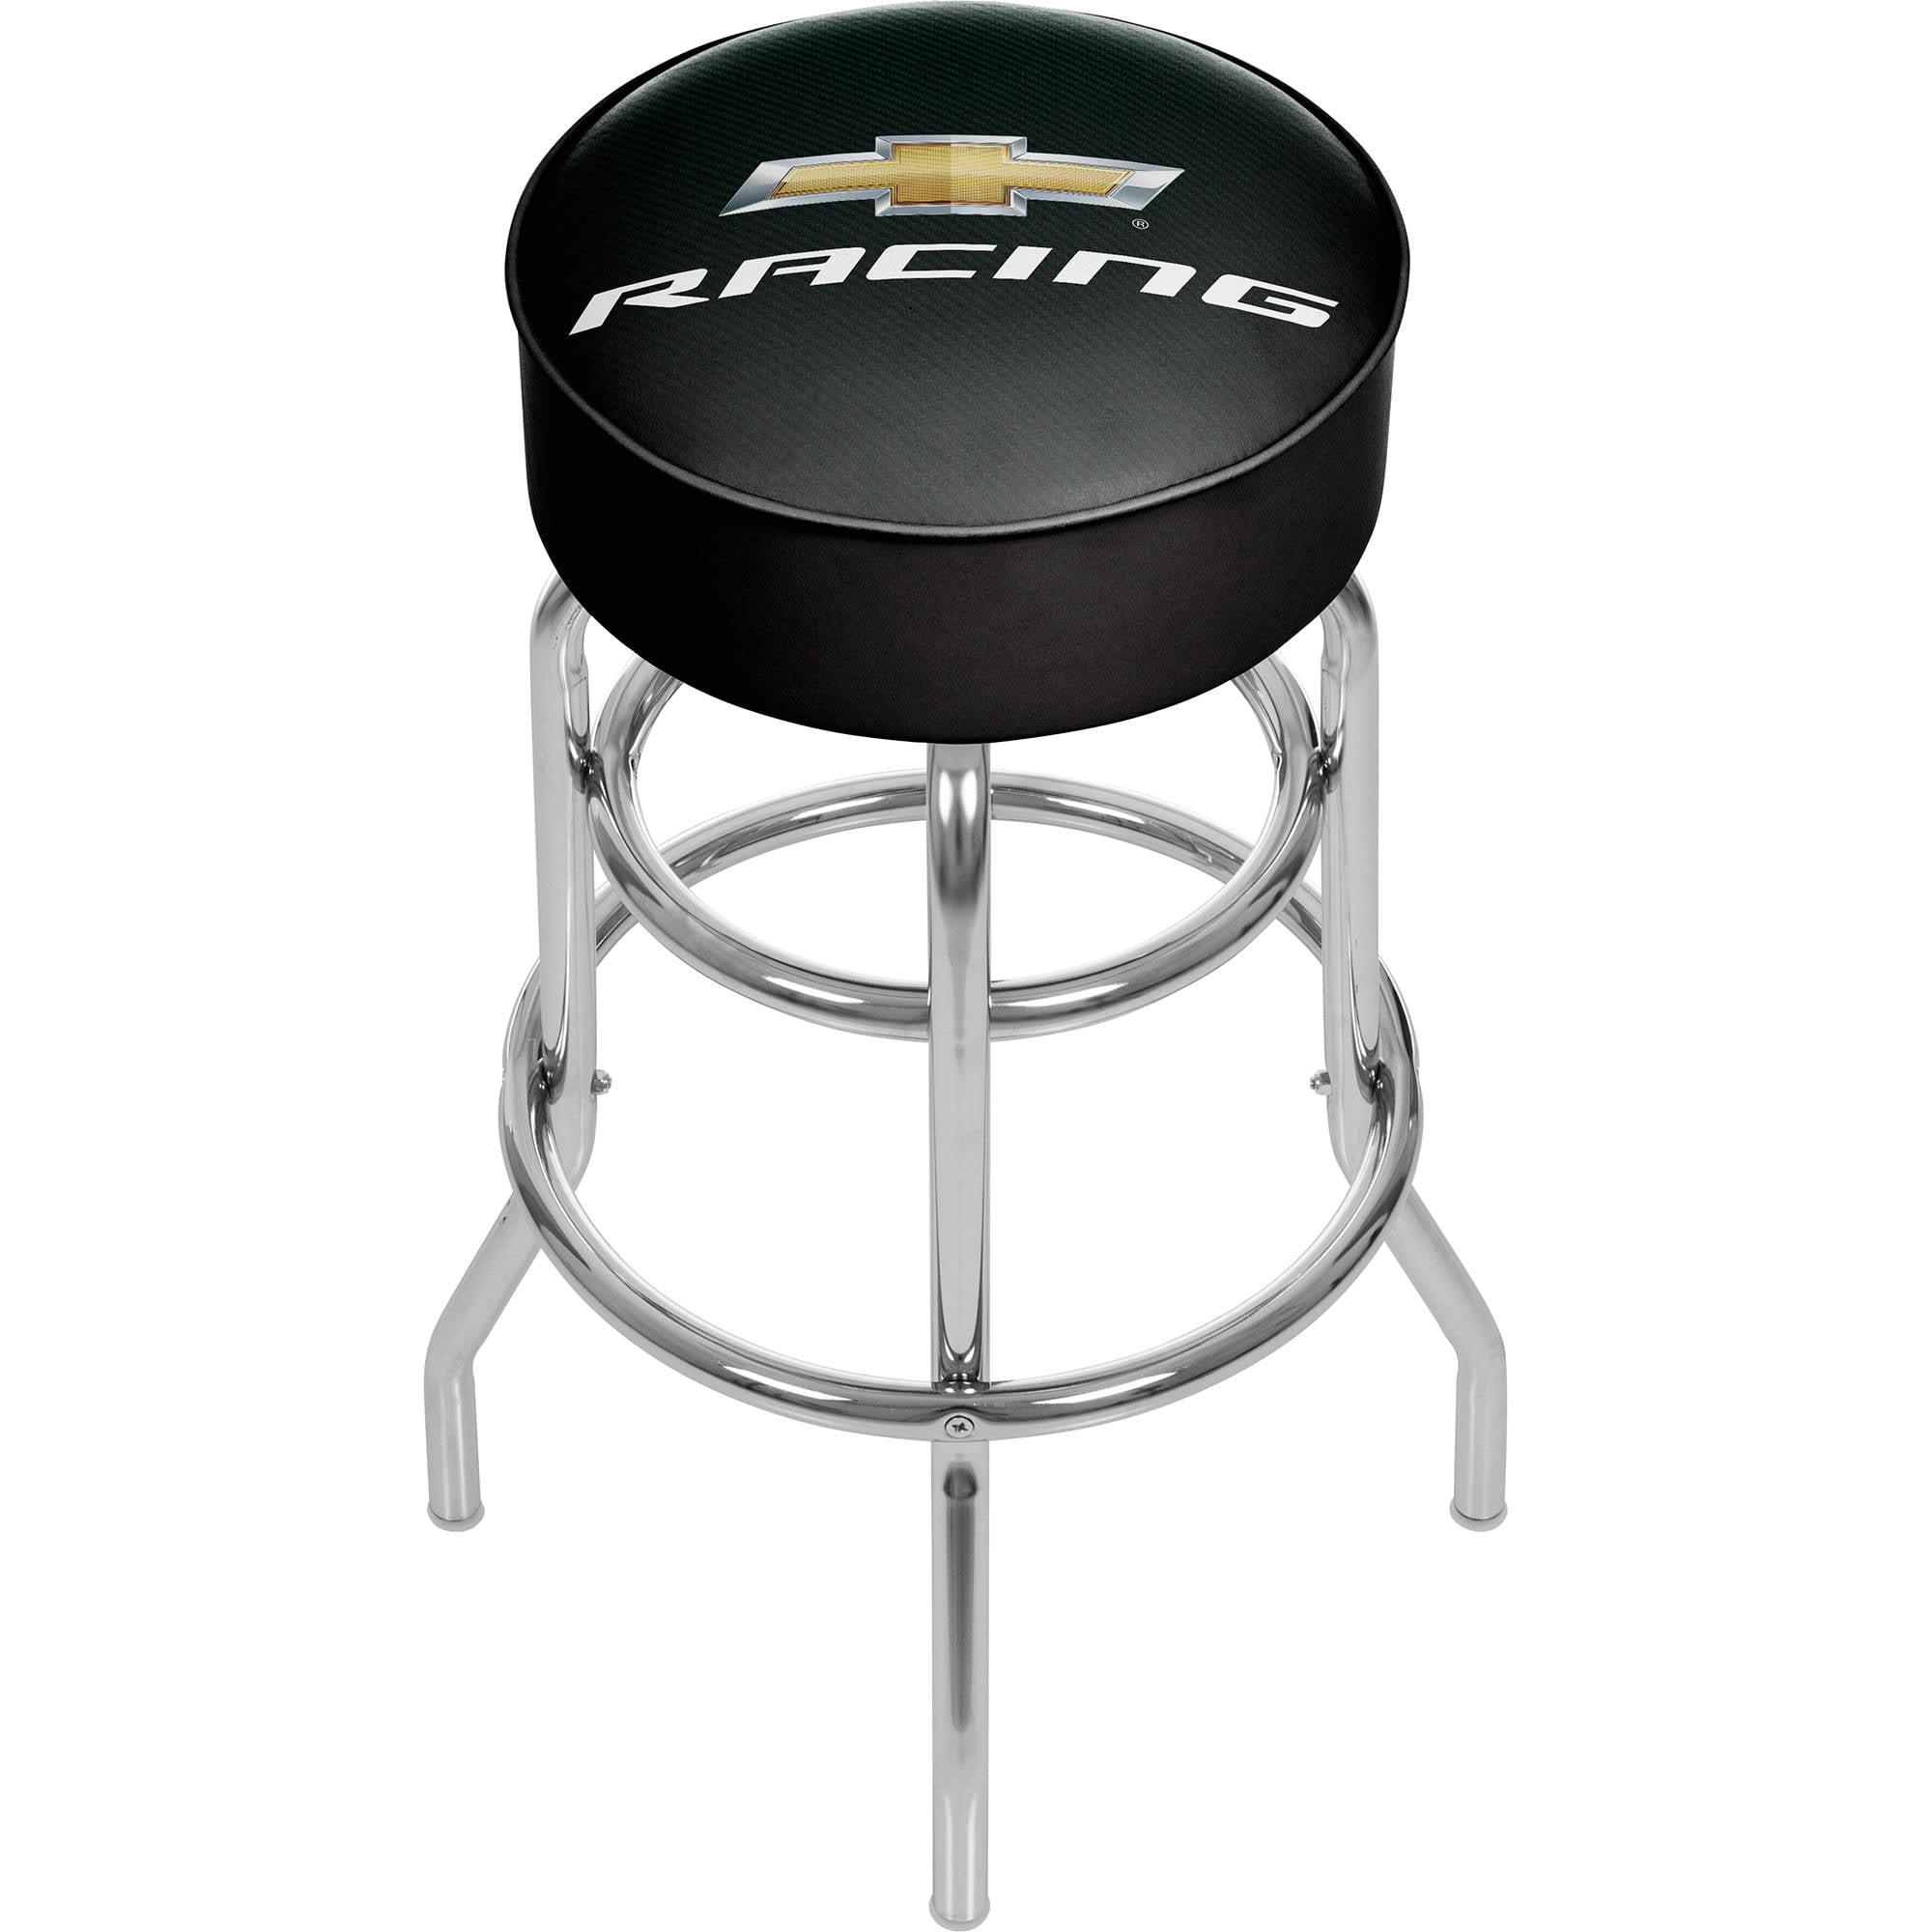 Chevrolet Padded Swivel Bar Stool, Chevy Racing